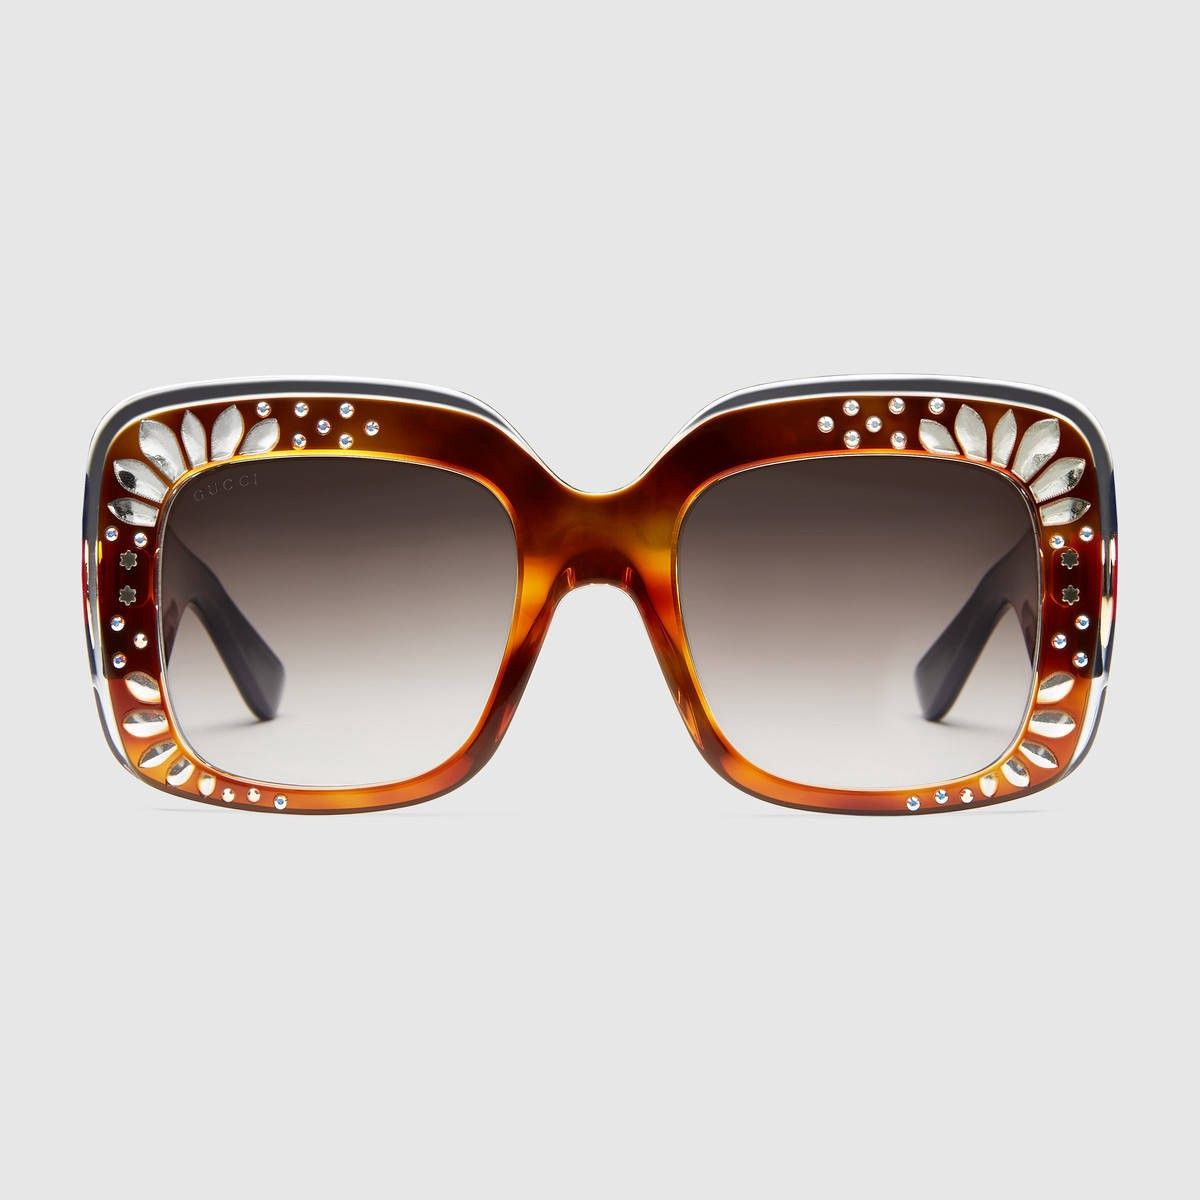 c0b8c8f98ab69 GUCCI Oversize Square-Frame Rhinestone Sunglasses - Tortoiseshell Acetate.   gucci  all